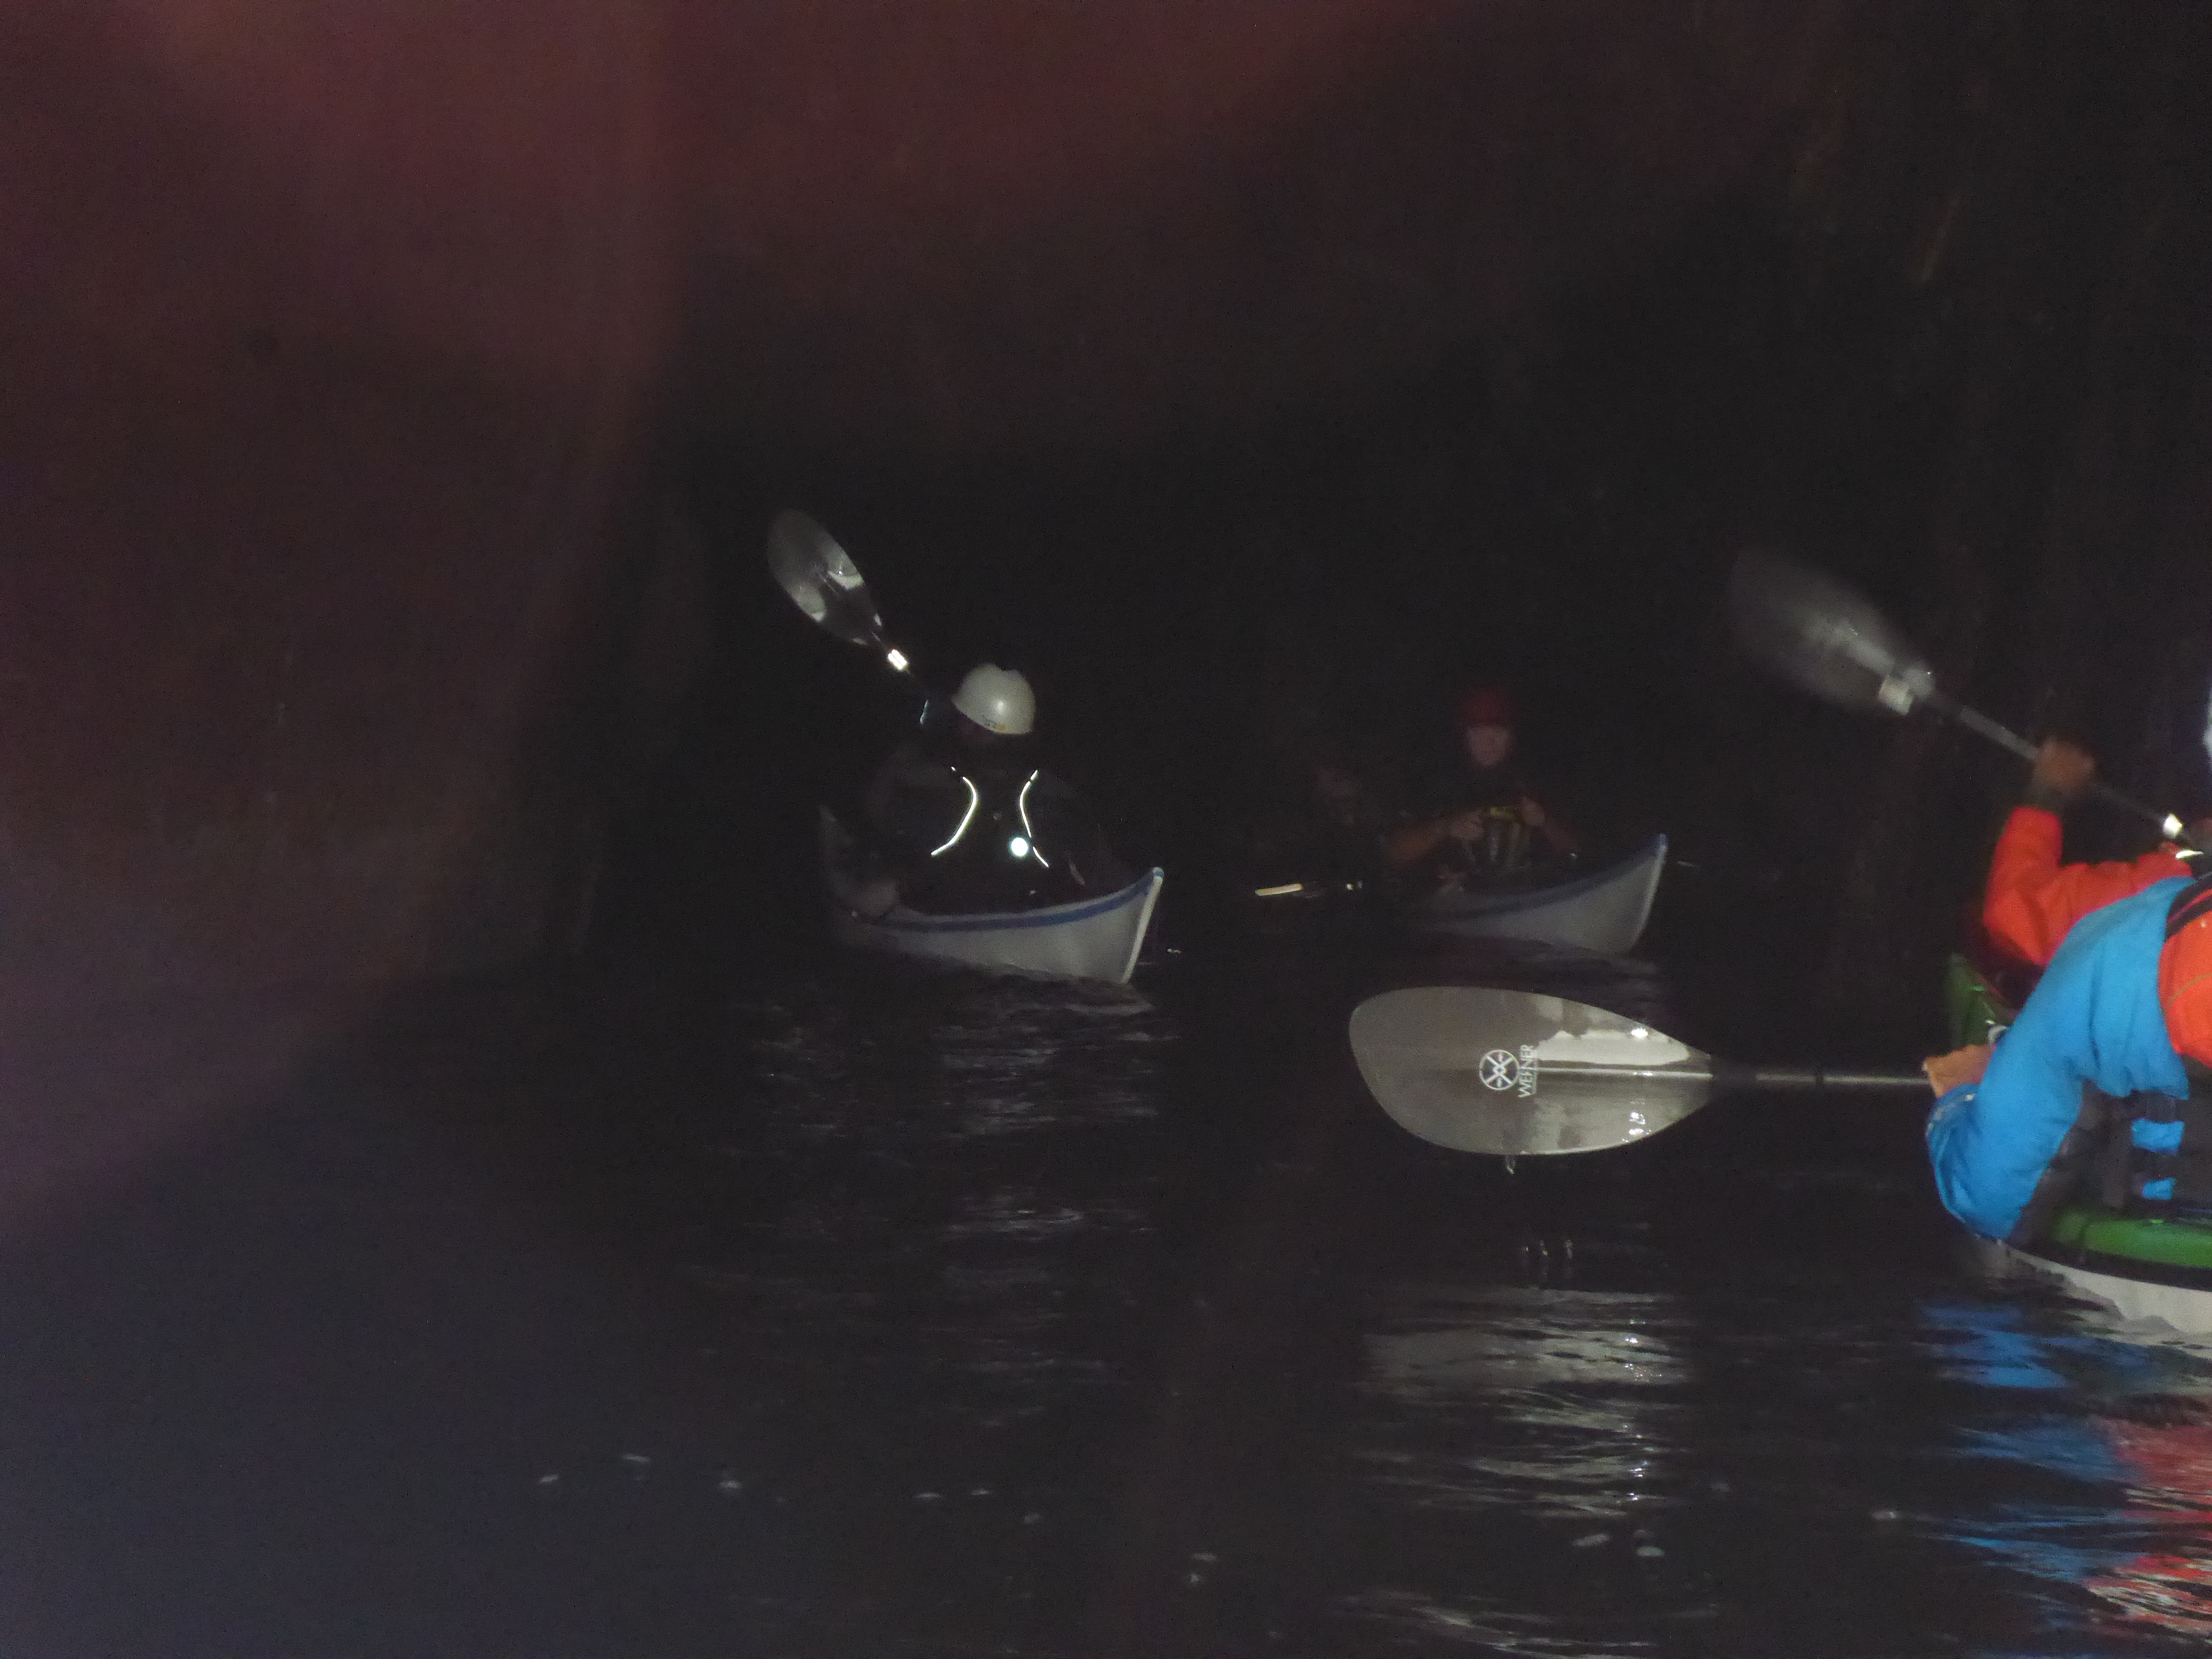 Headlamps needed in cave